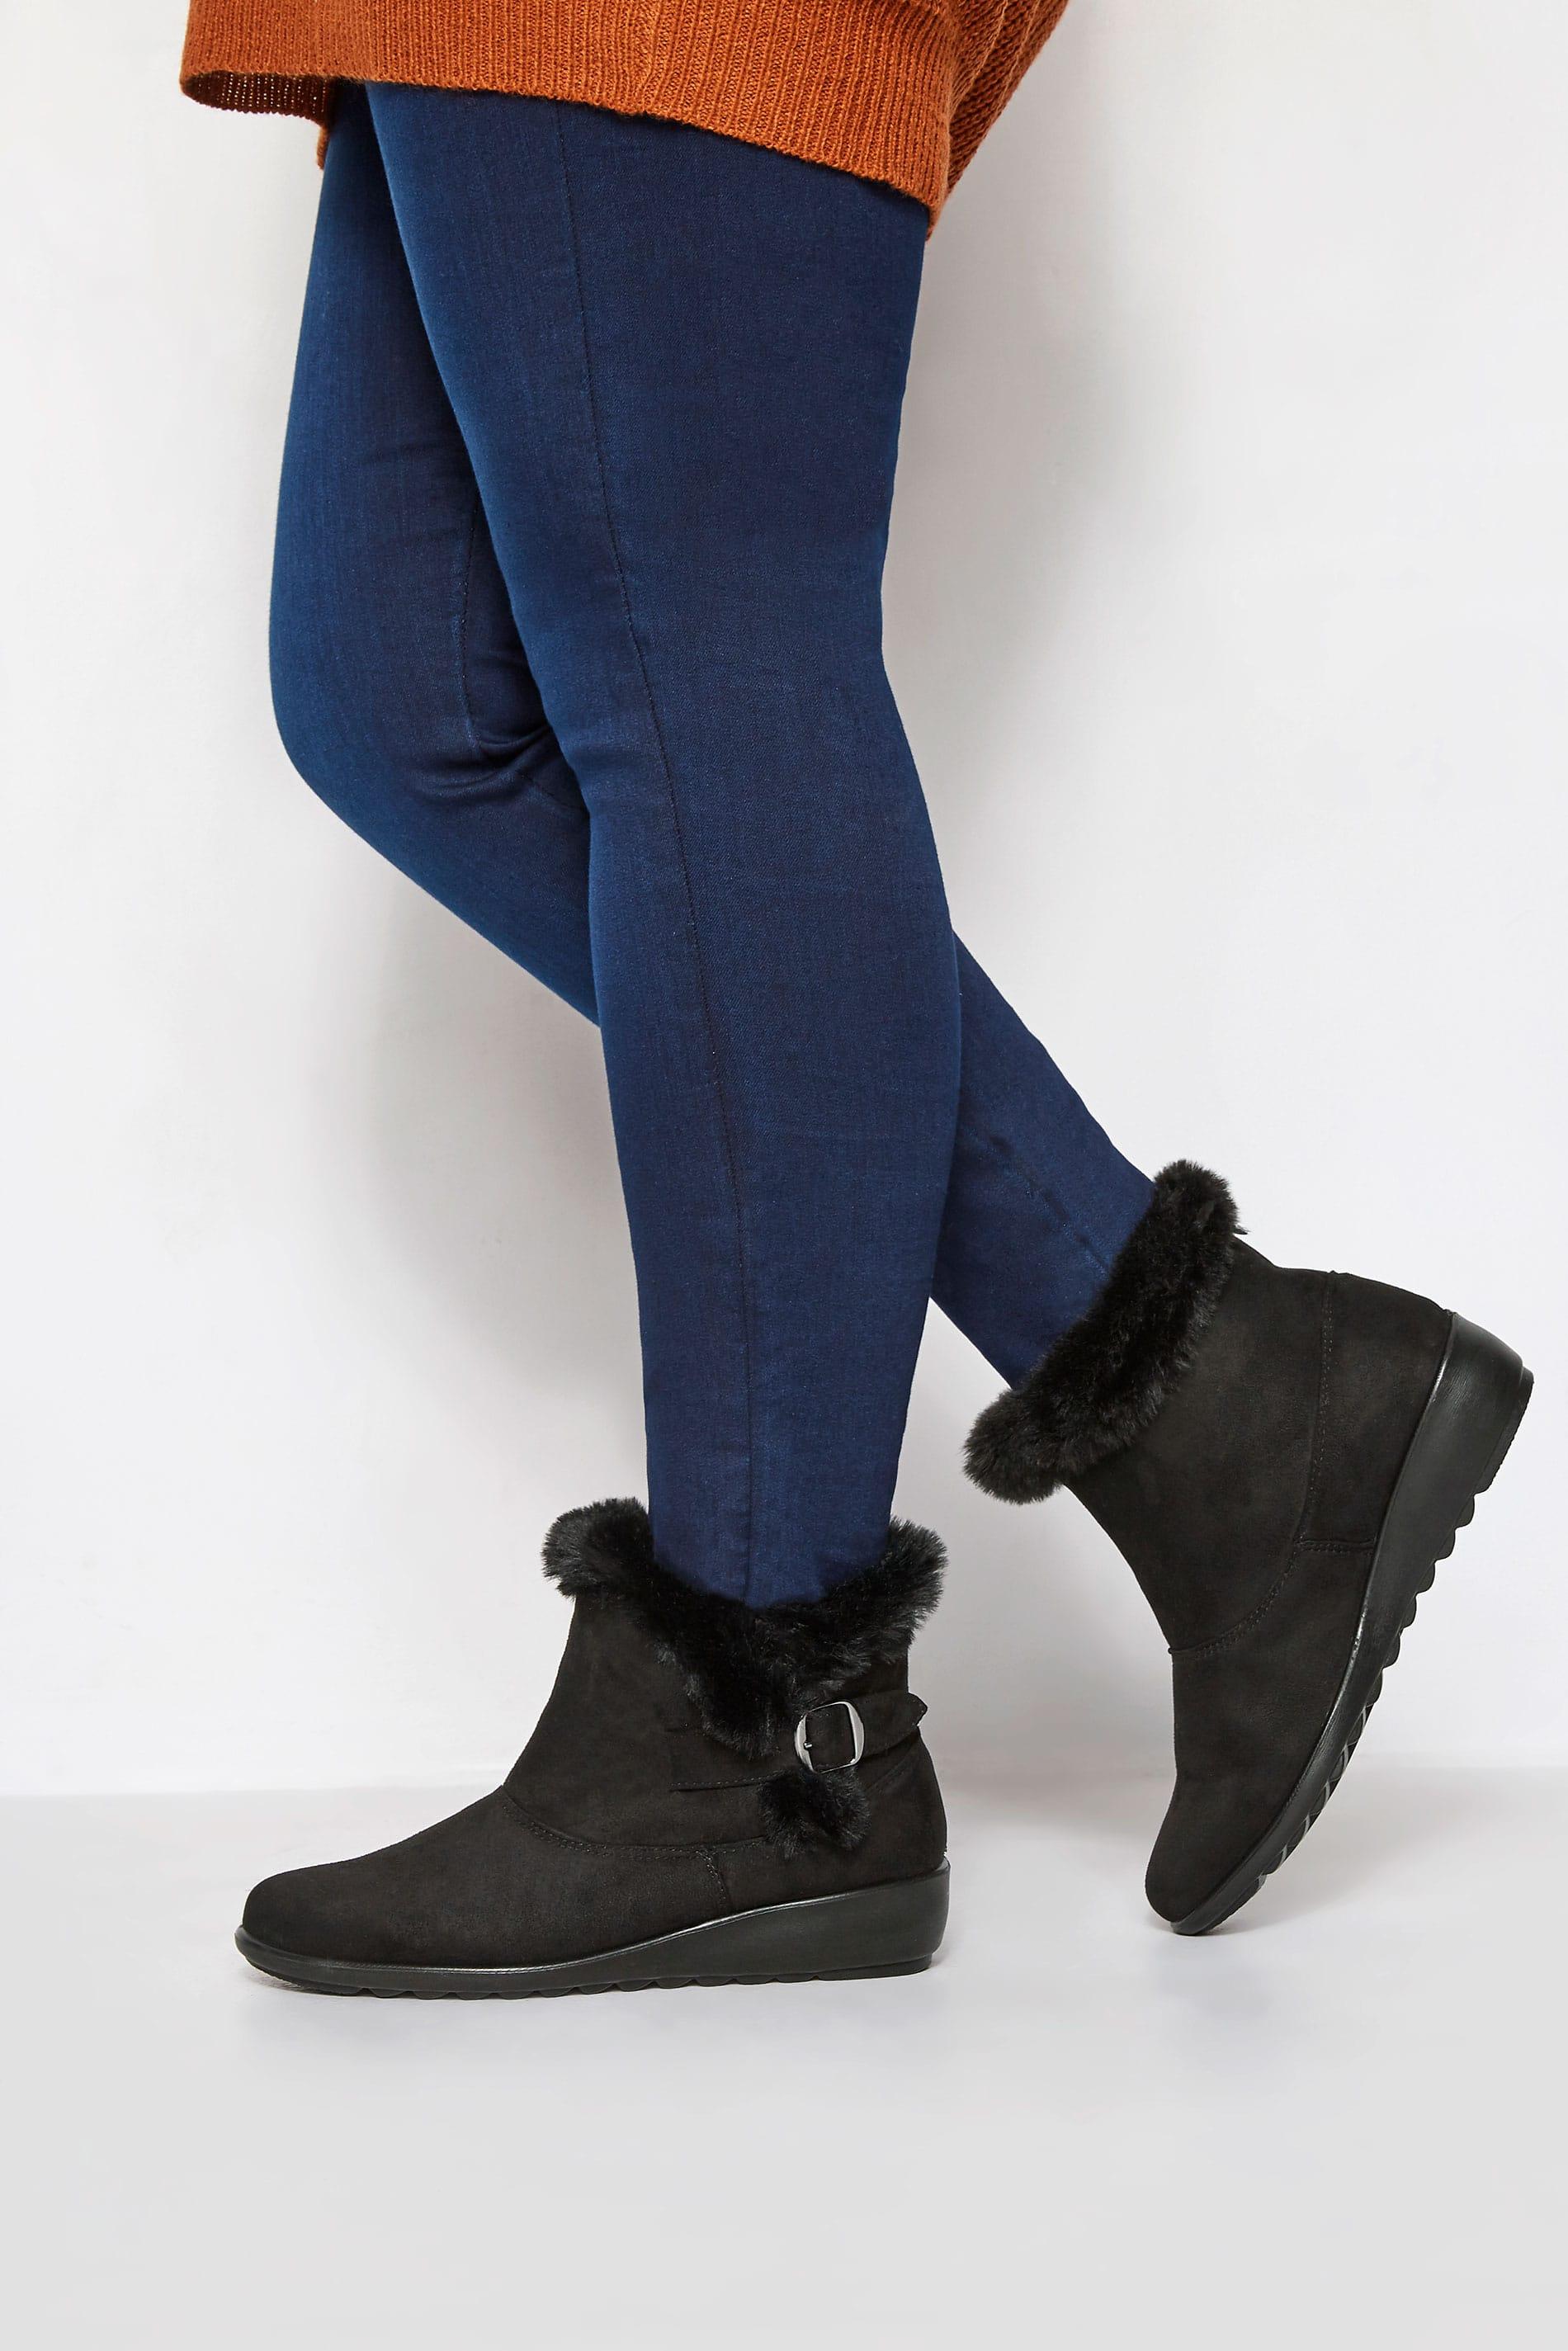 Black Faux Fur Trim Ankle Boot In EEE Fit